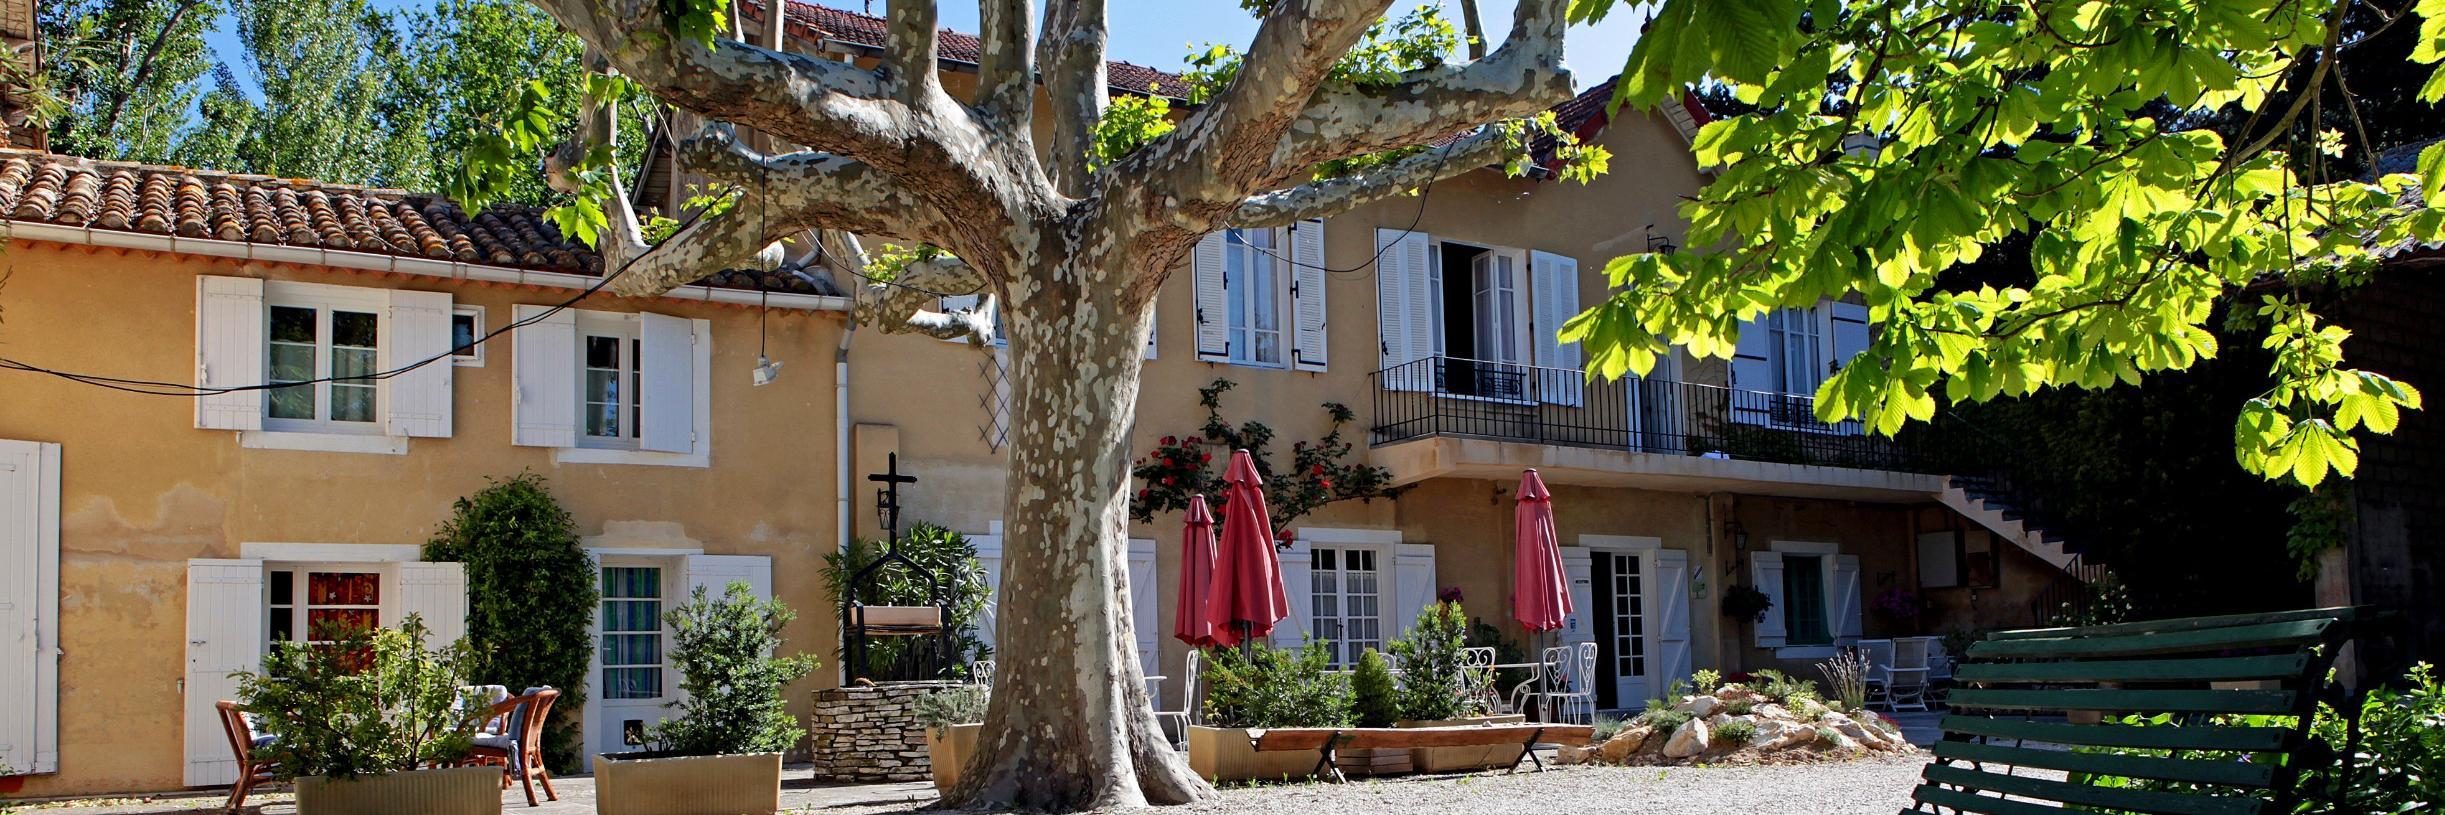 H U00f4tel Avignon Dans Vaucluse  Restaurants Logis Hotels Avignon